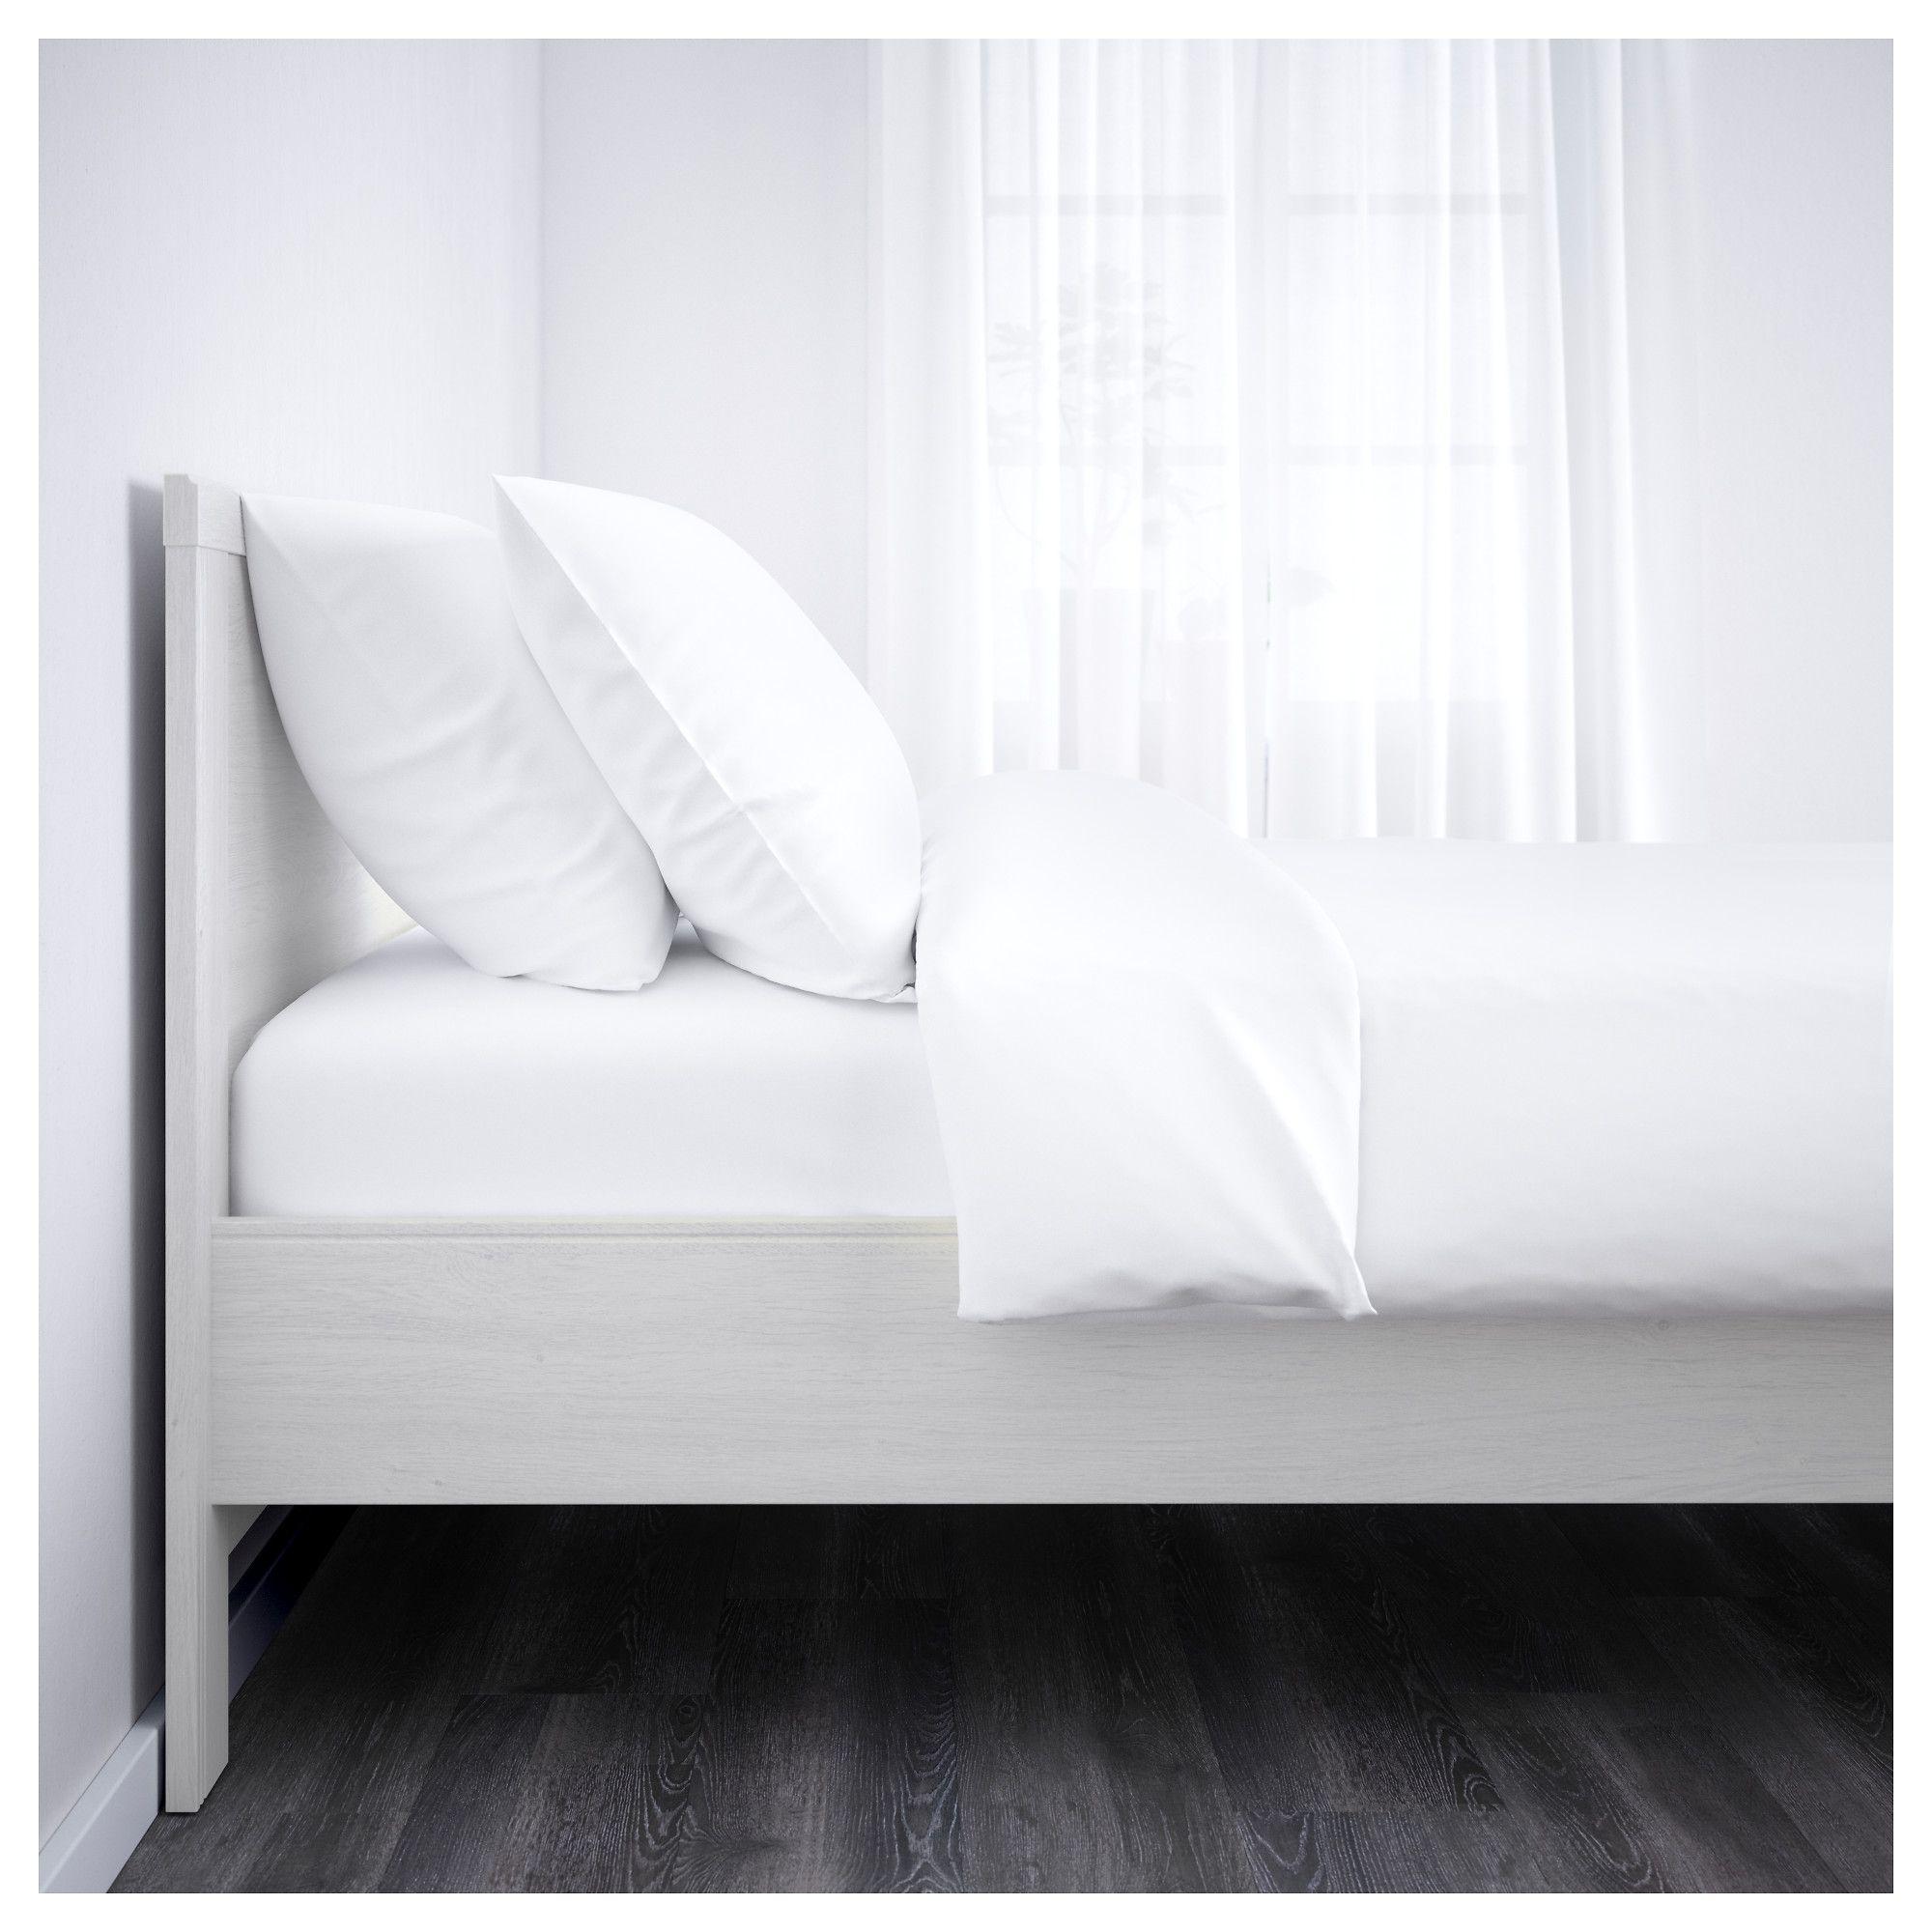 Furniture And Home Furnishings Adjustable Beds Bed Frame Hemnes Bed